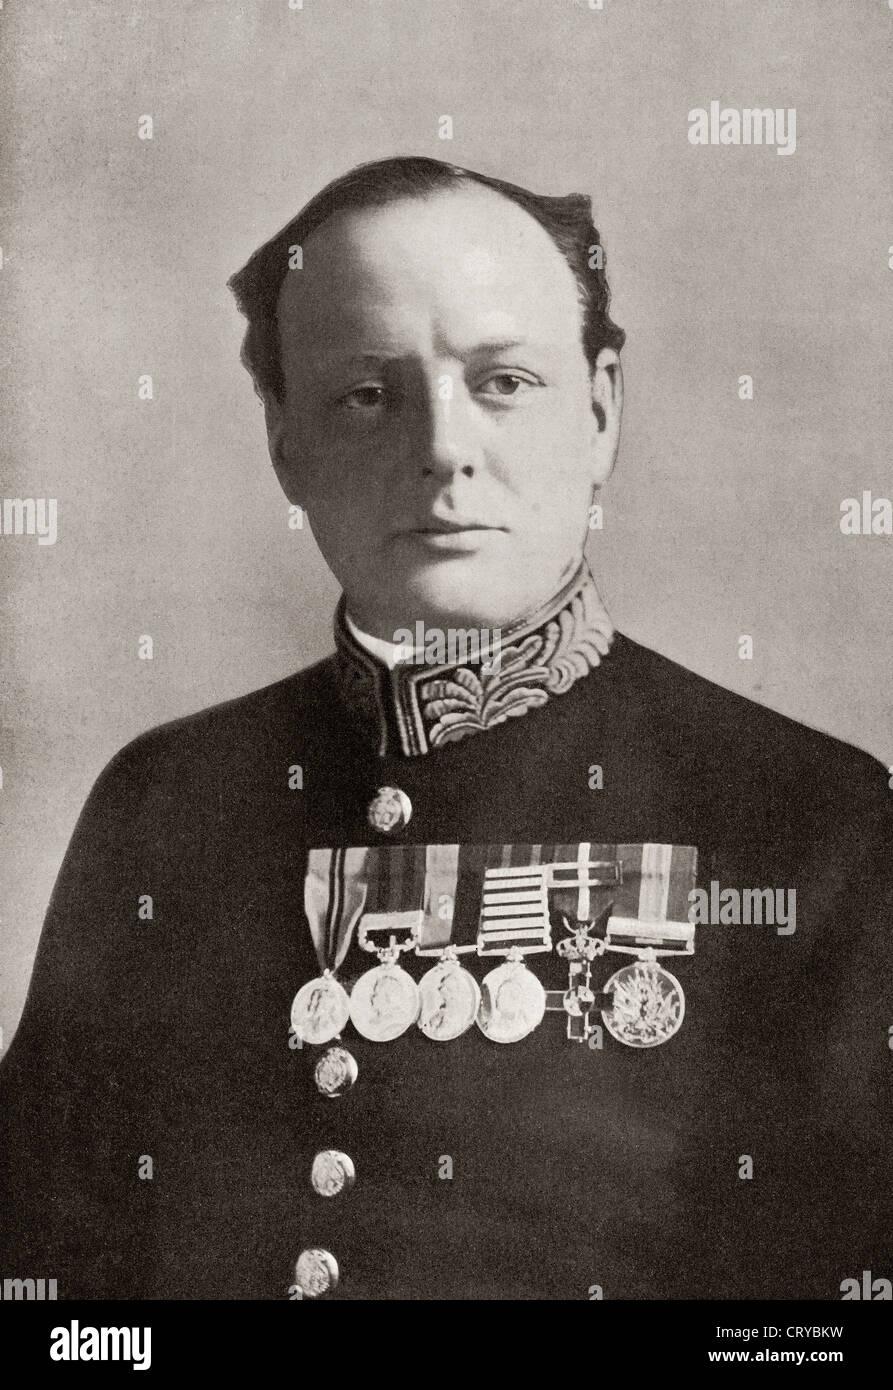 Sir Winston Churchill, 1874 – 1965. British politician and statesman. Here seen in uniform during World War One. - Stock Image